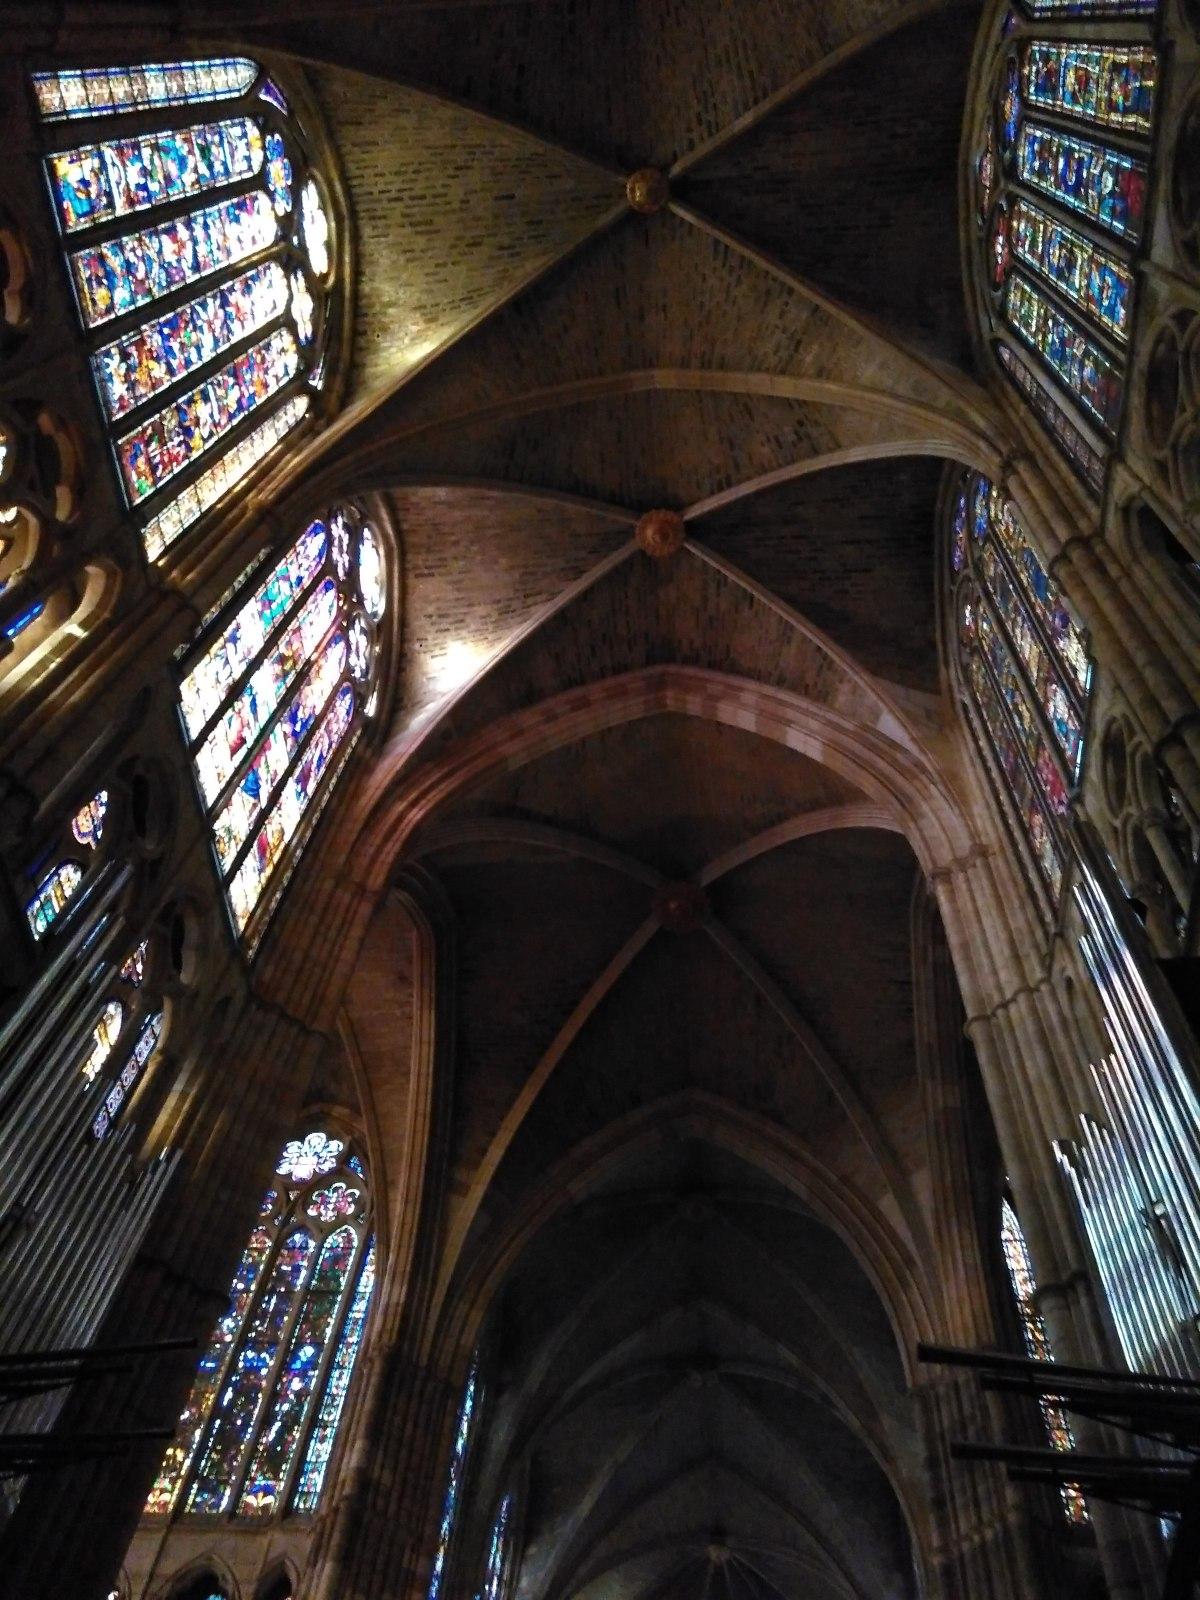 Ton Koopman, Catedral de León, hoy a las 20,30, entrada libre 4ief4j